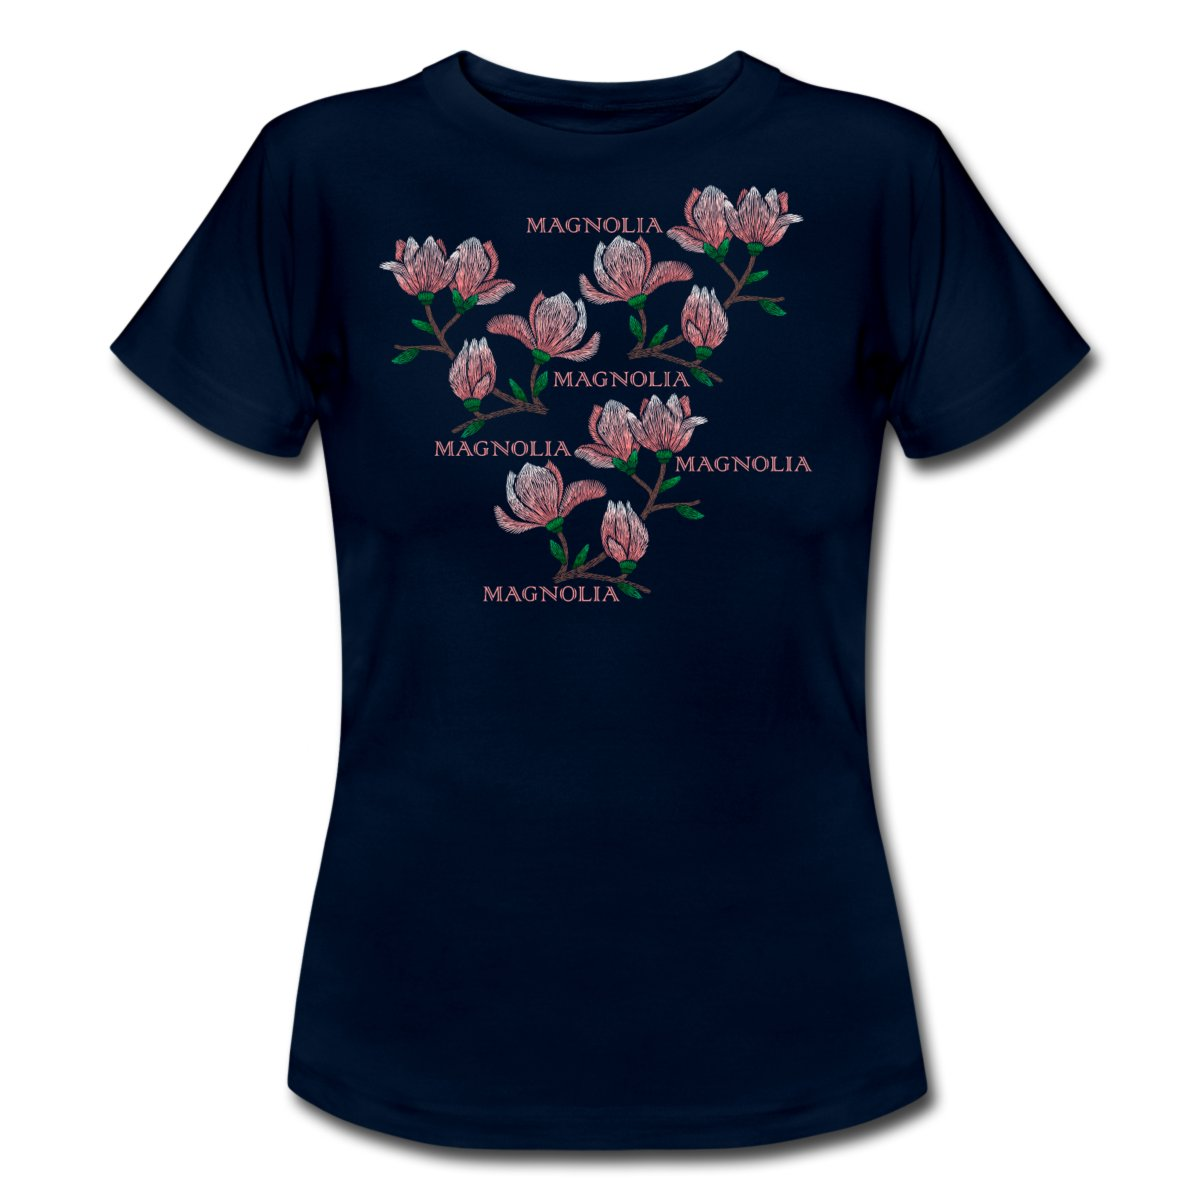 magnolia-t-shirt-dam-mb.jpg